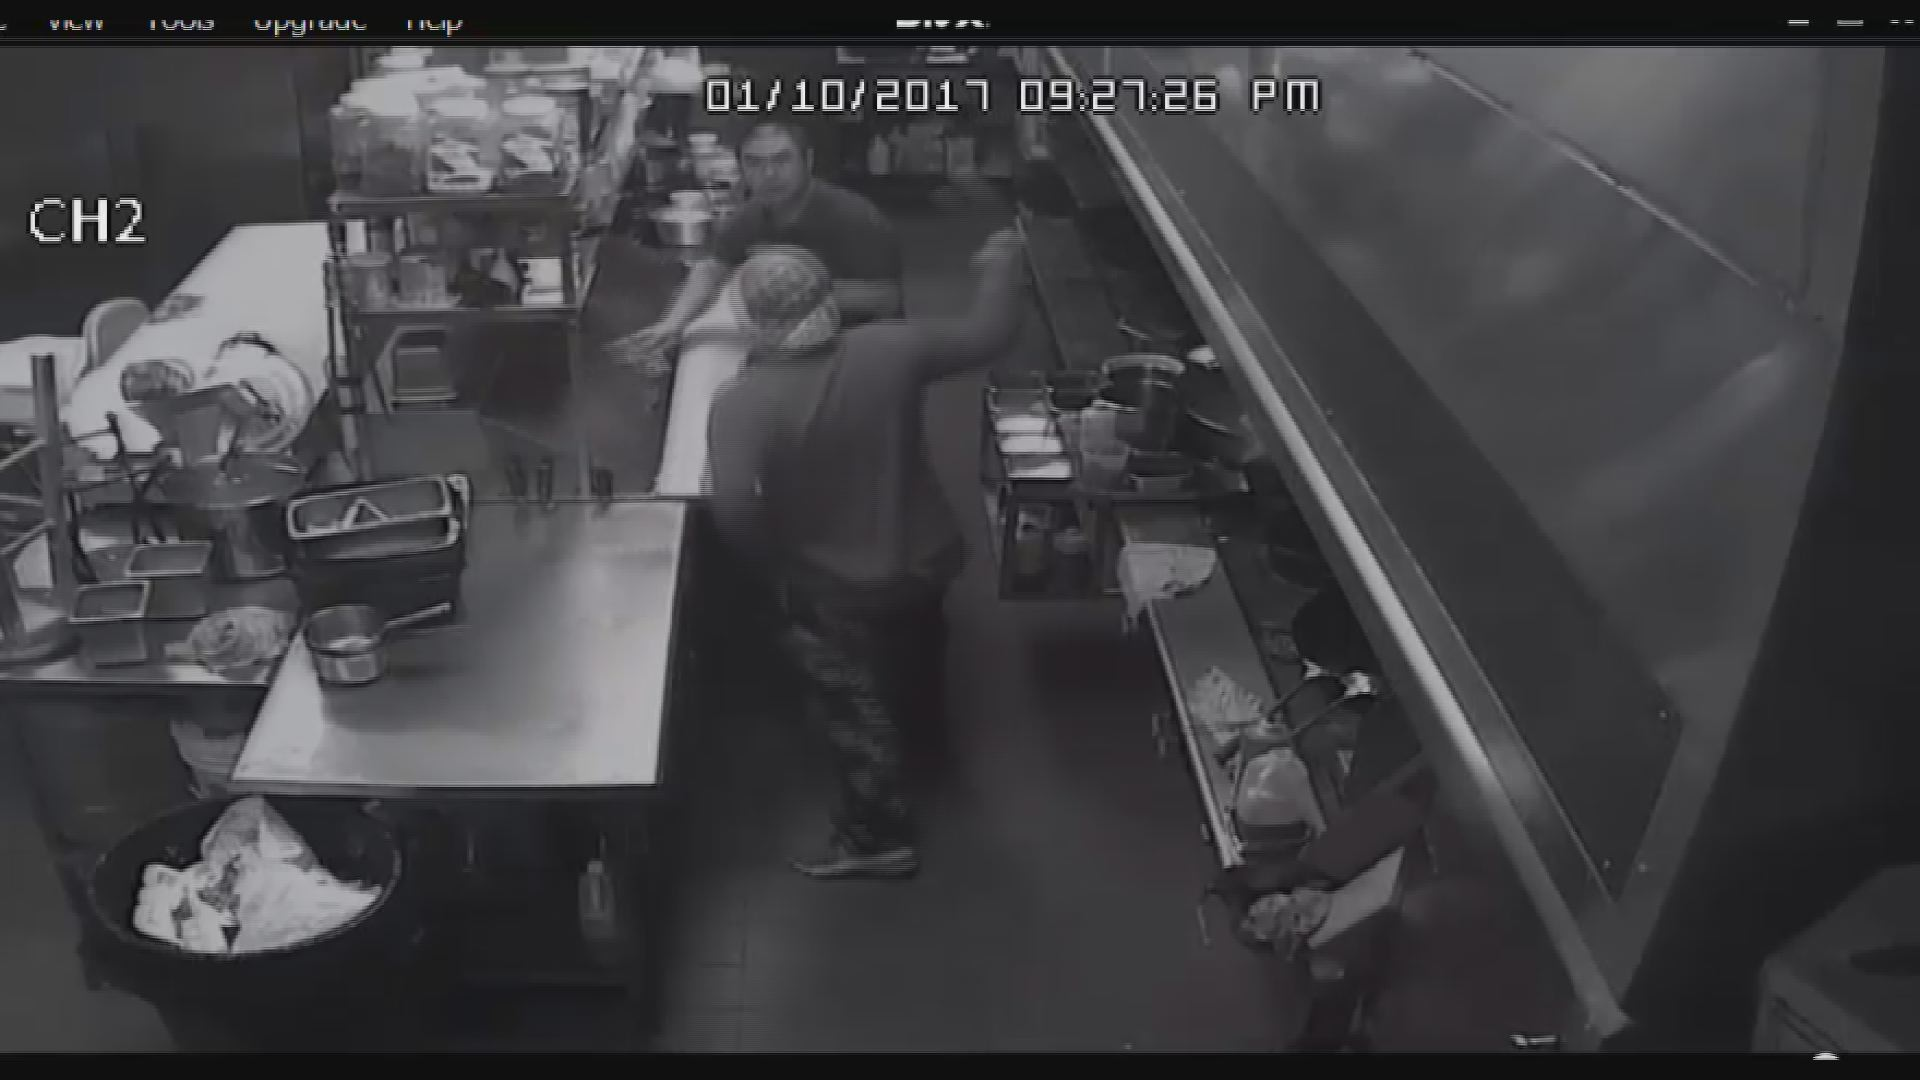 winter haven restaurant cleaver attack caught on camera wtsp com